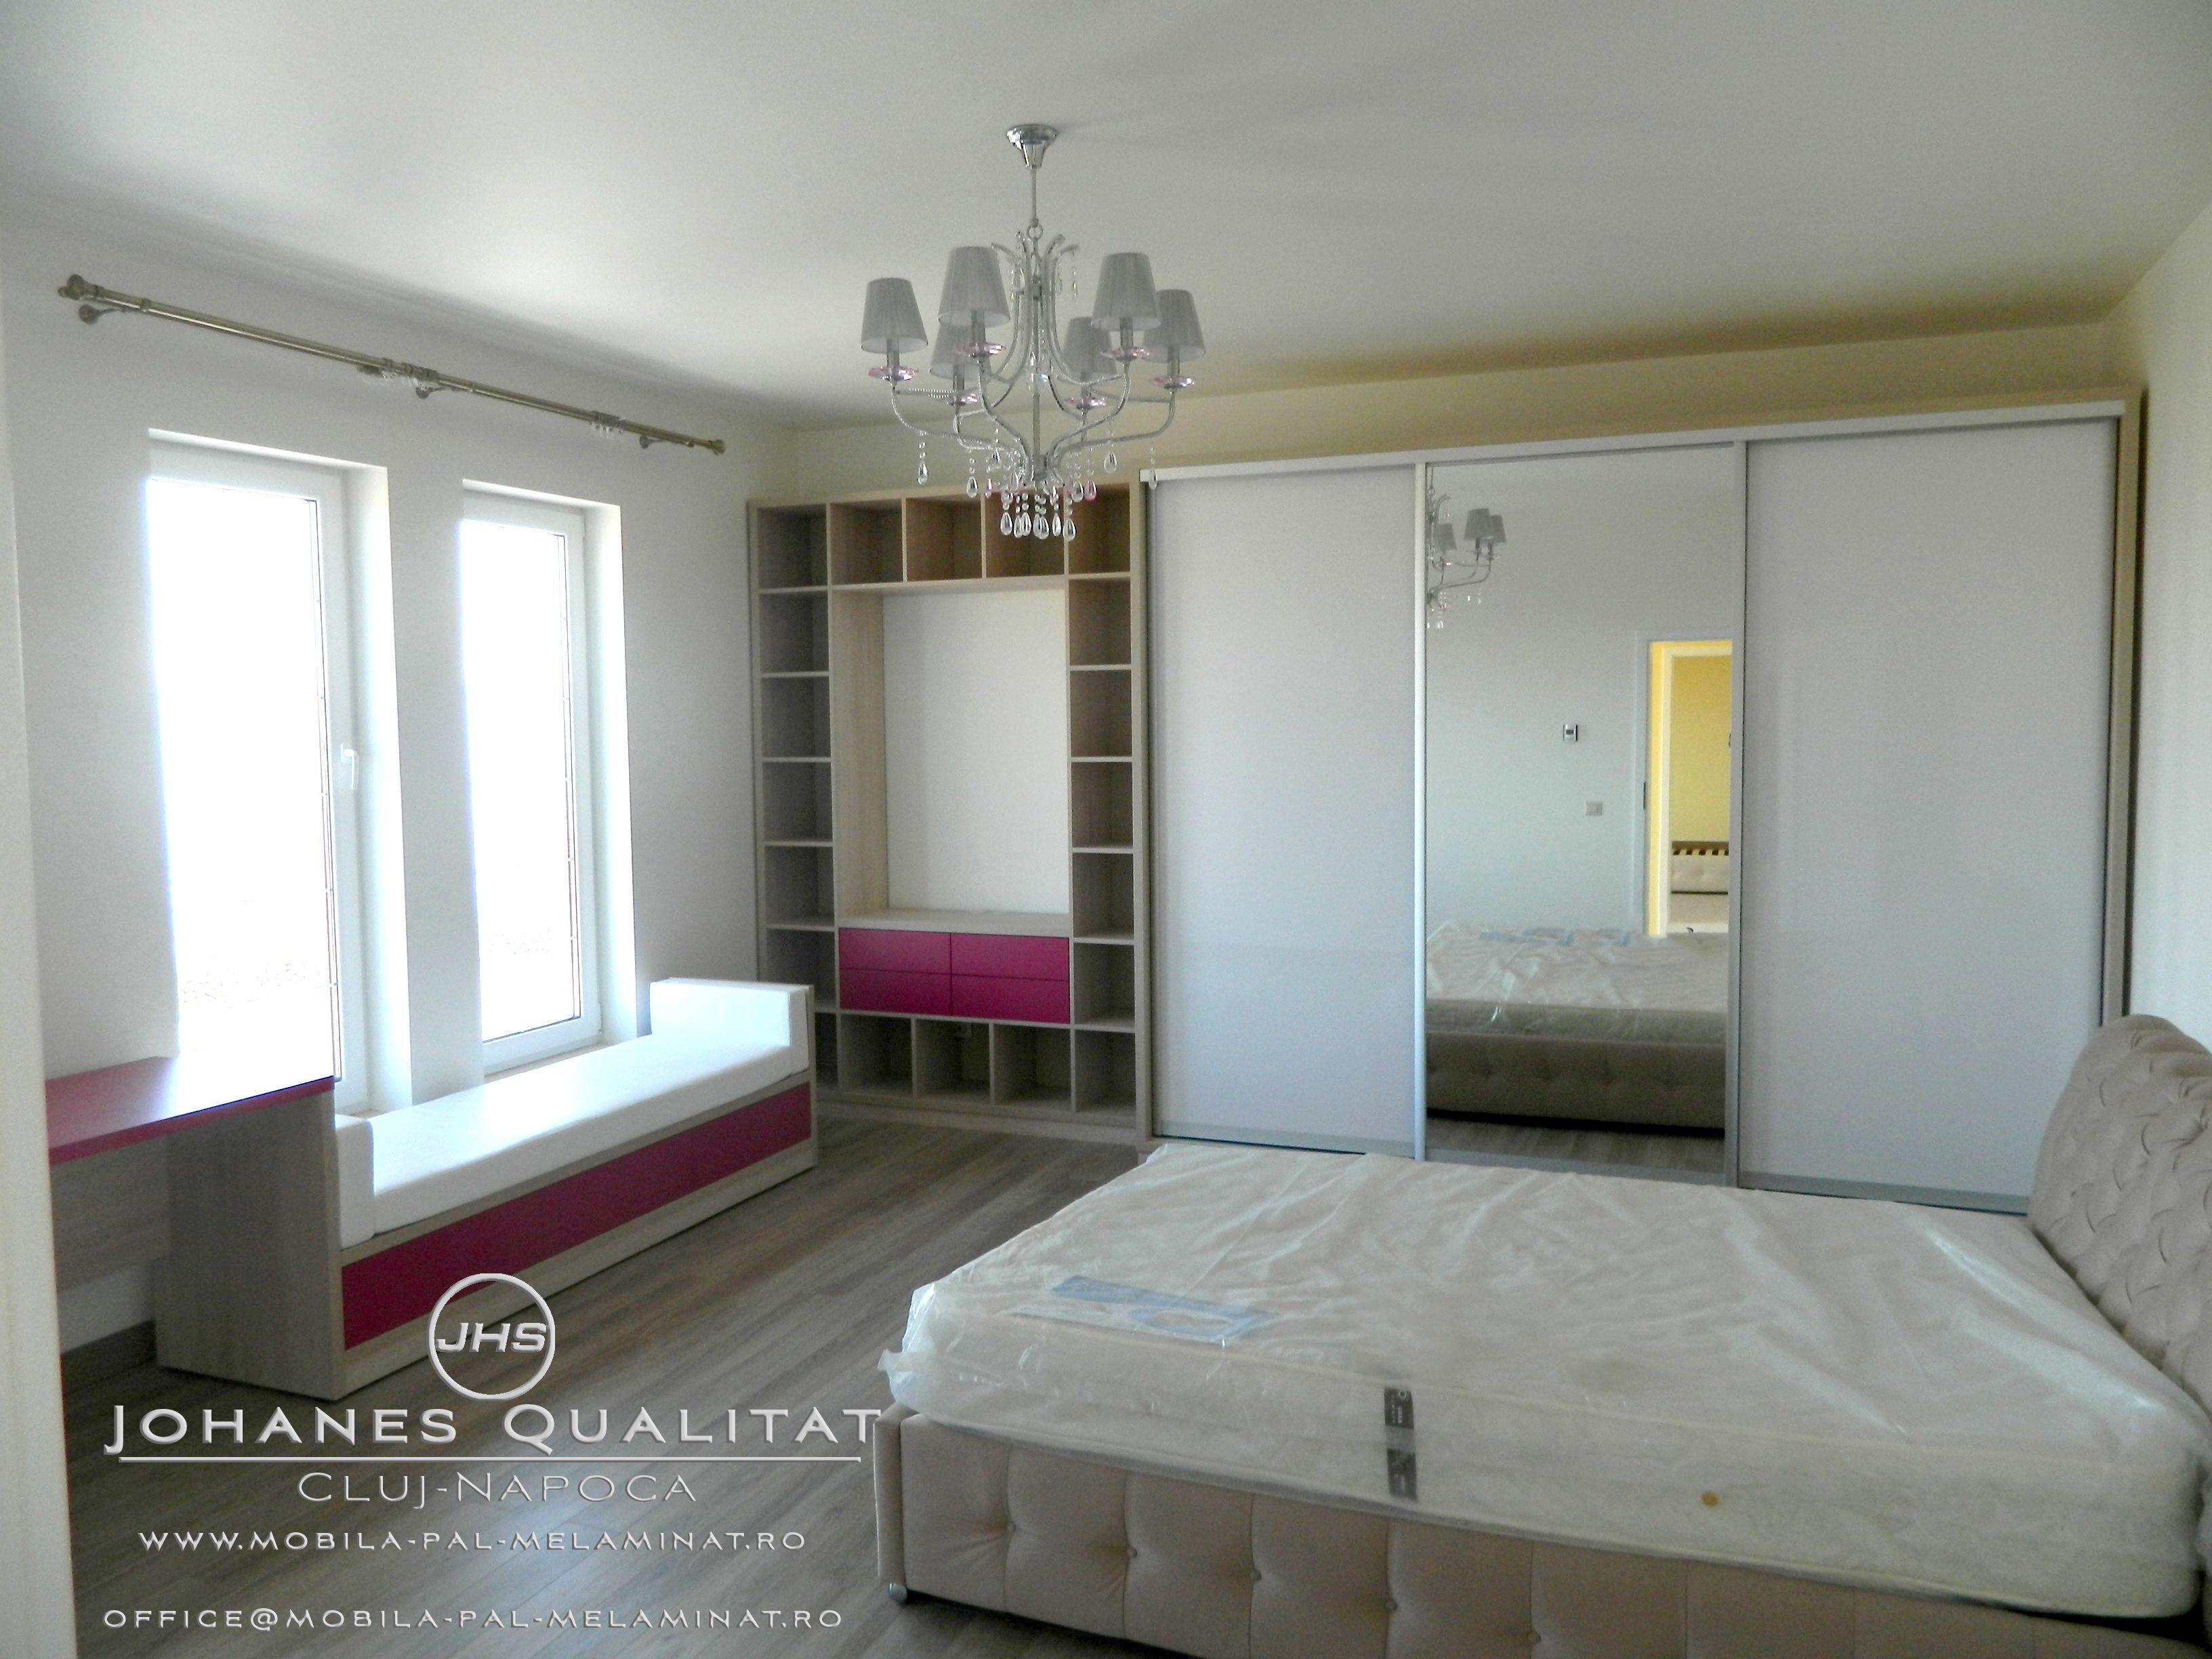 DORMITOARE Mobila Dormitor Johanes Qualitat Cluj PAL Melaminat Personalizata La Comanda Bucatarie